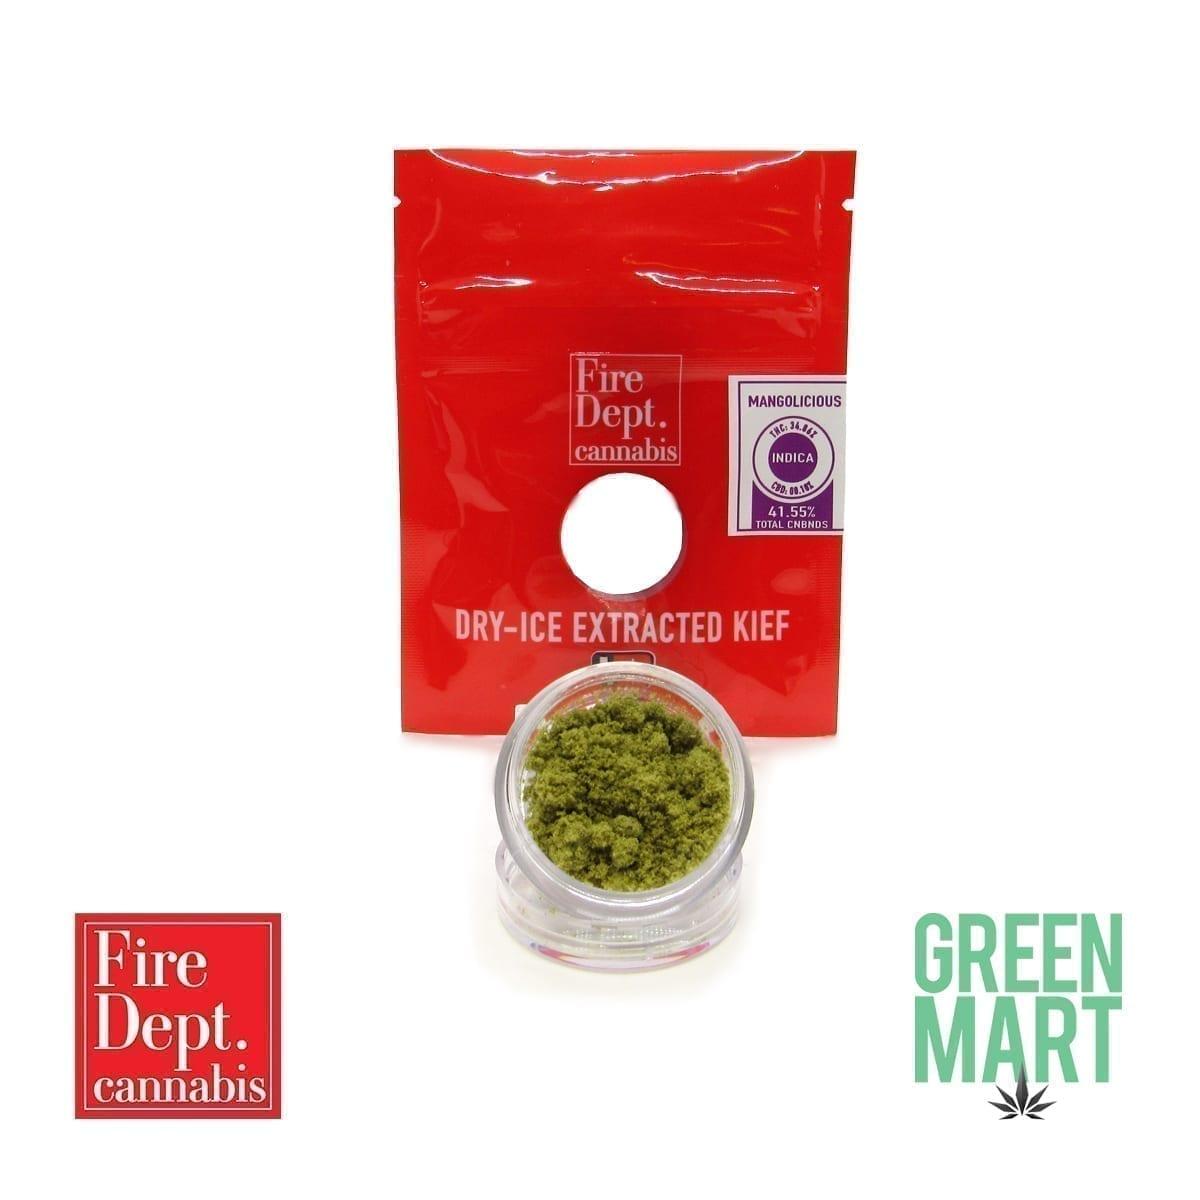 Kief by Fire Dept. Cannabis - Mangolicious